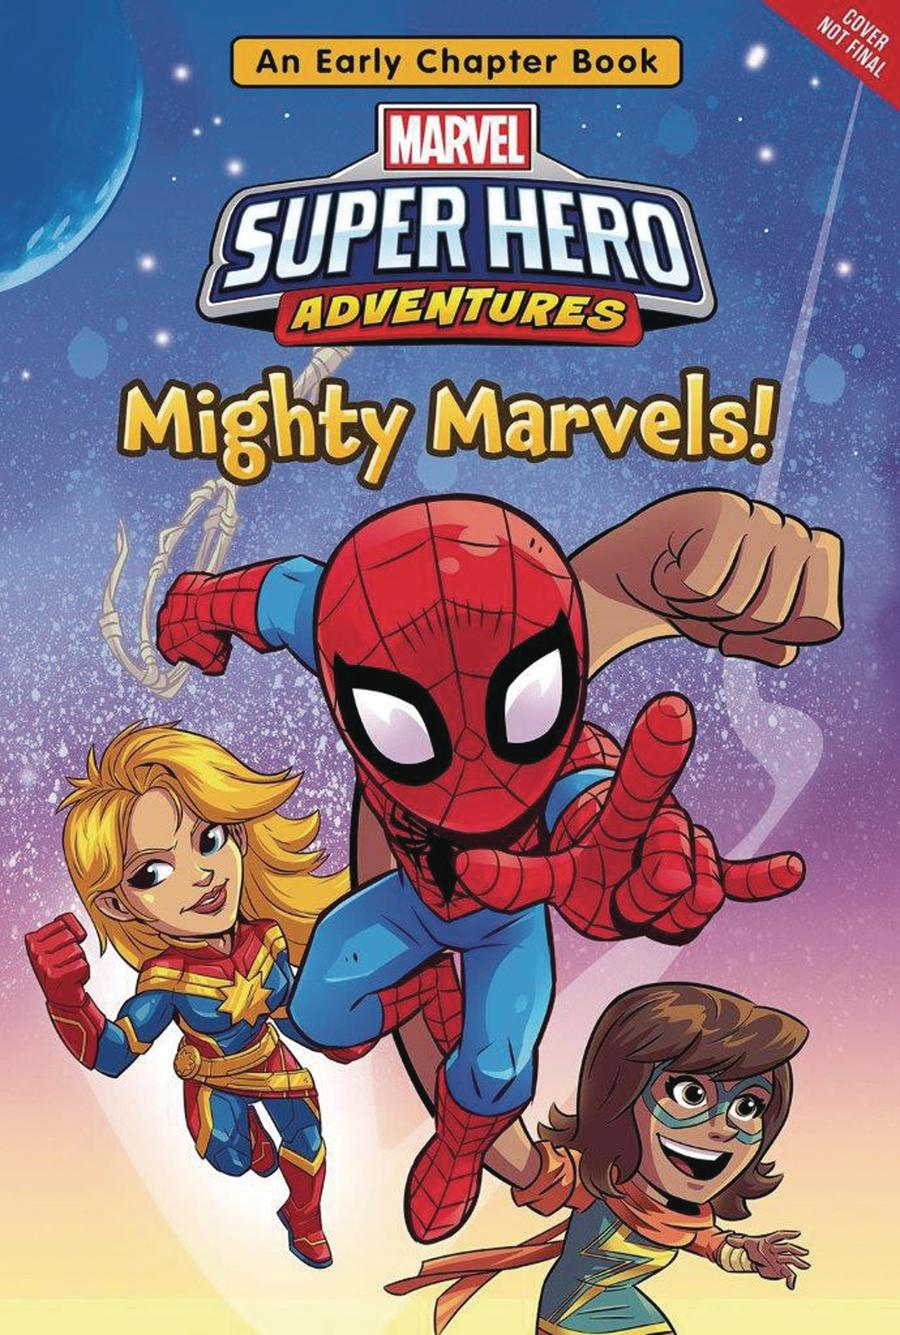 Marvel Superhero Adventures Mighty Marvels SC